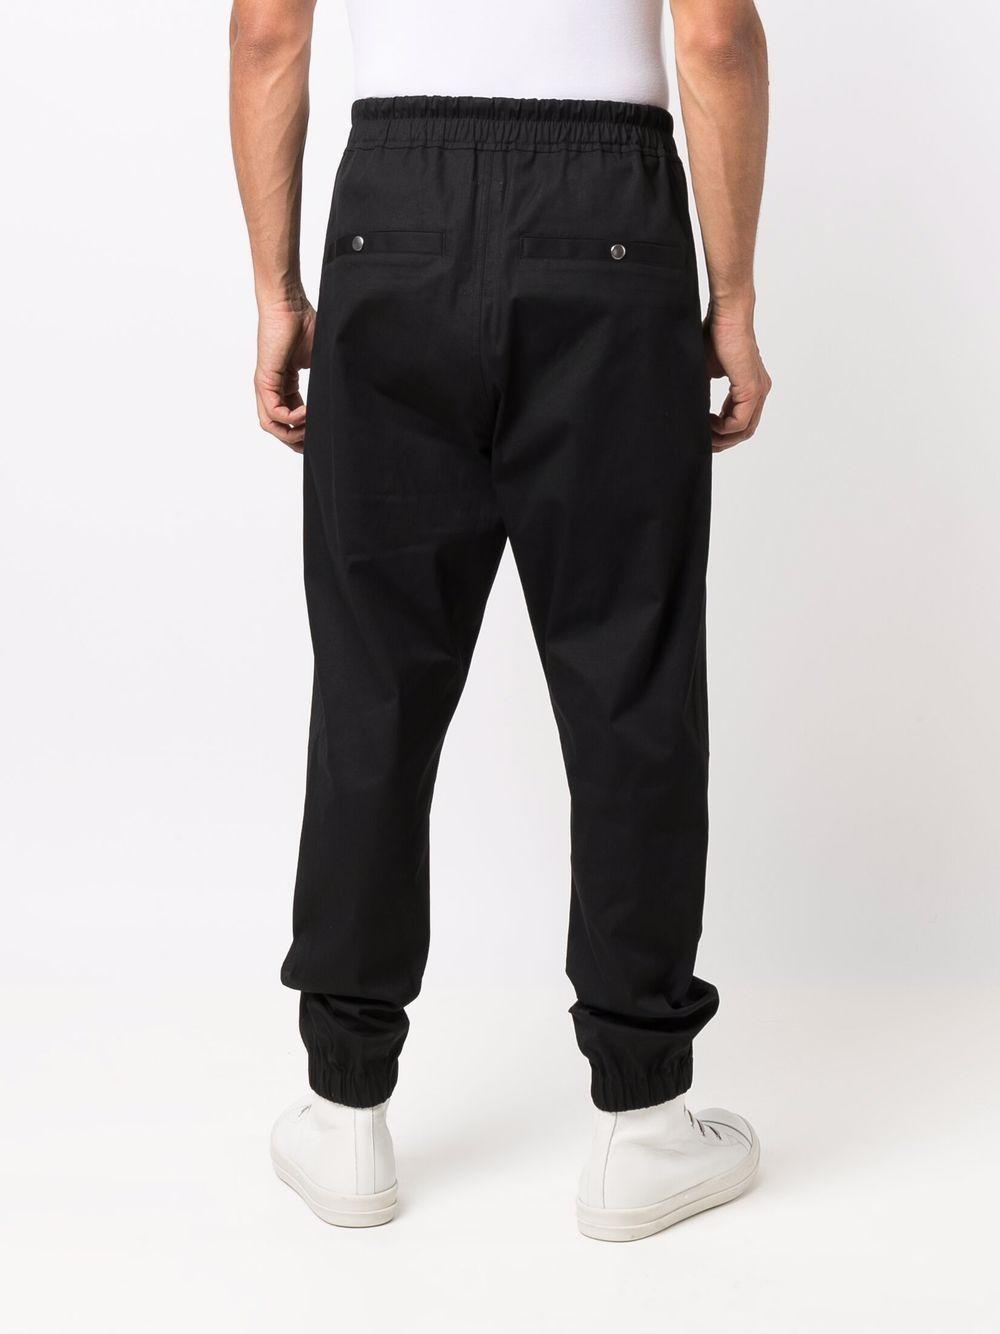 sport trousers man black in cotton RICK OWENS | Trousers | RU02A5370 TE09